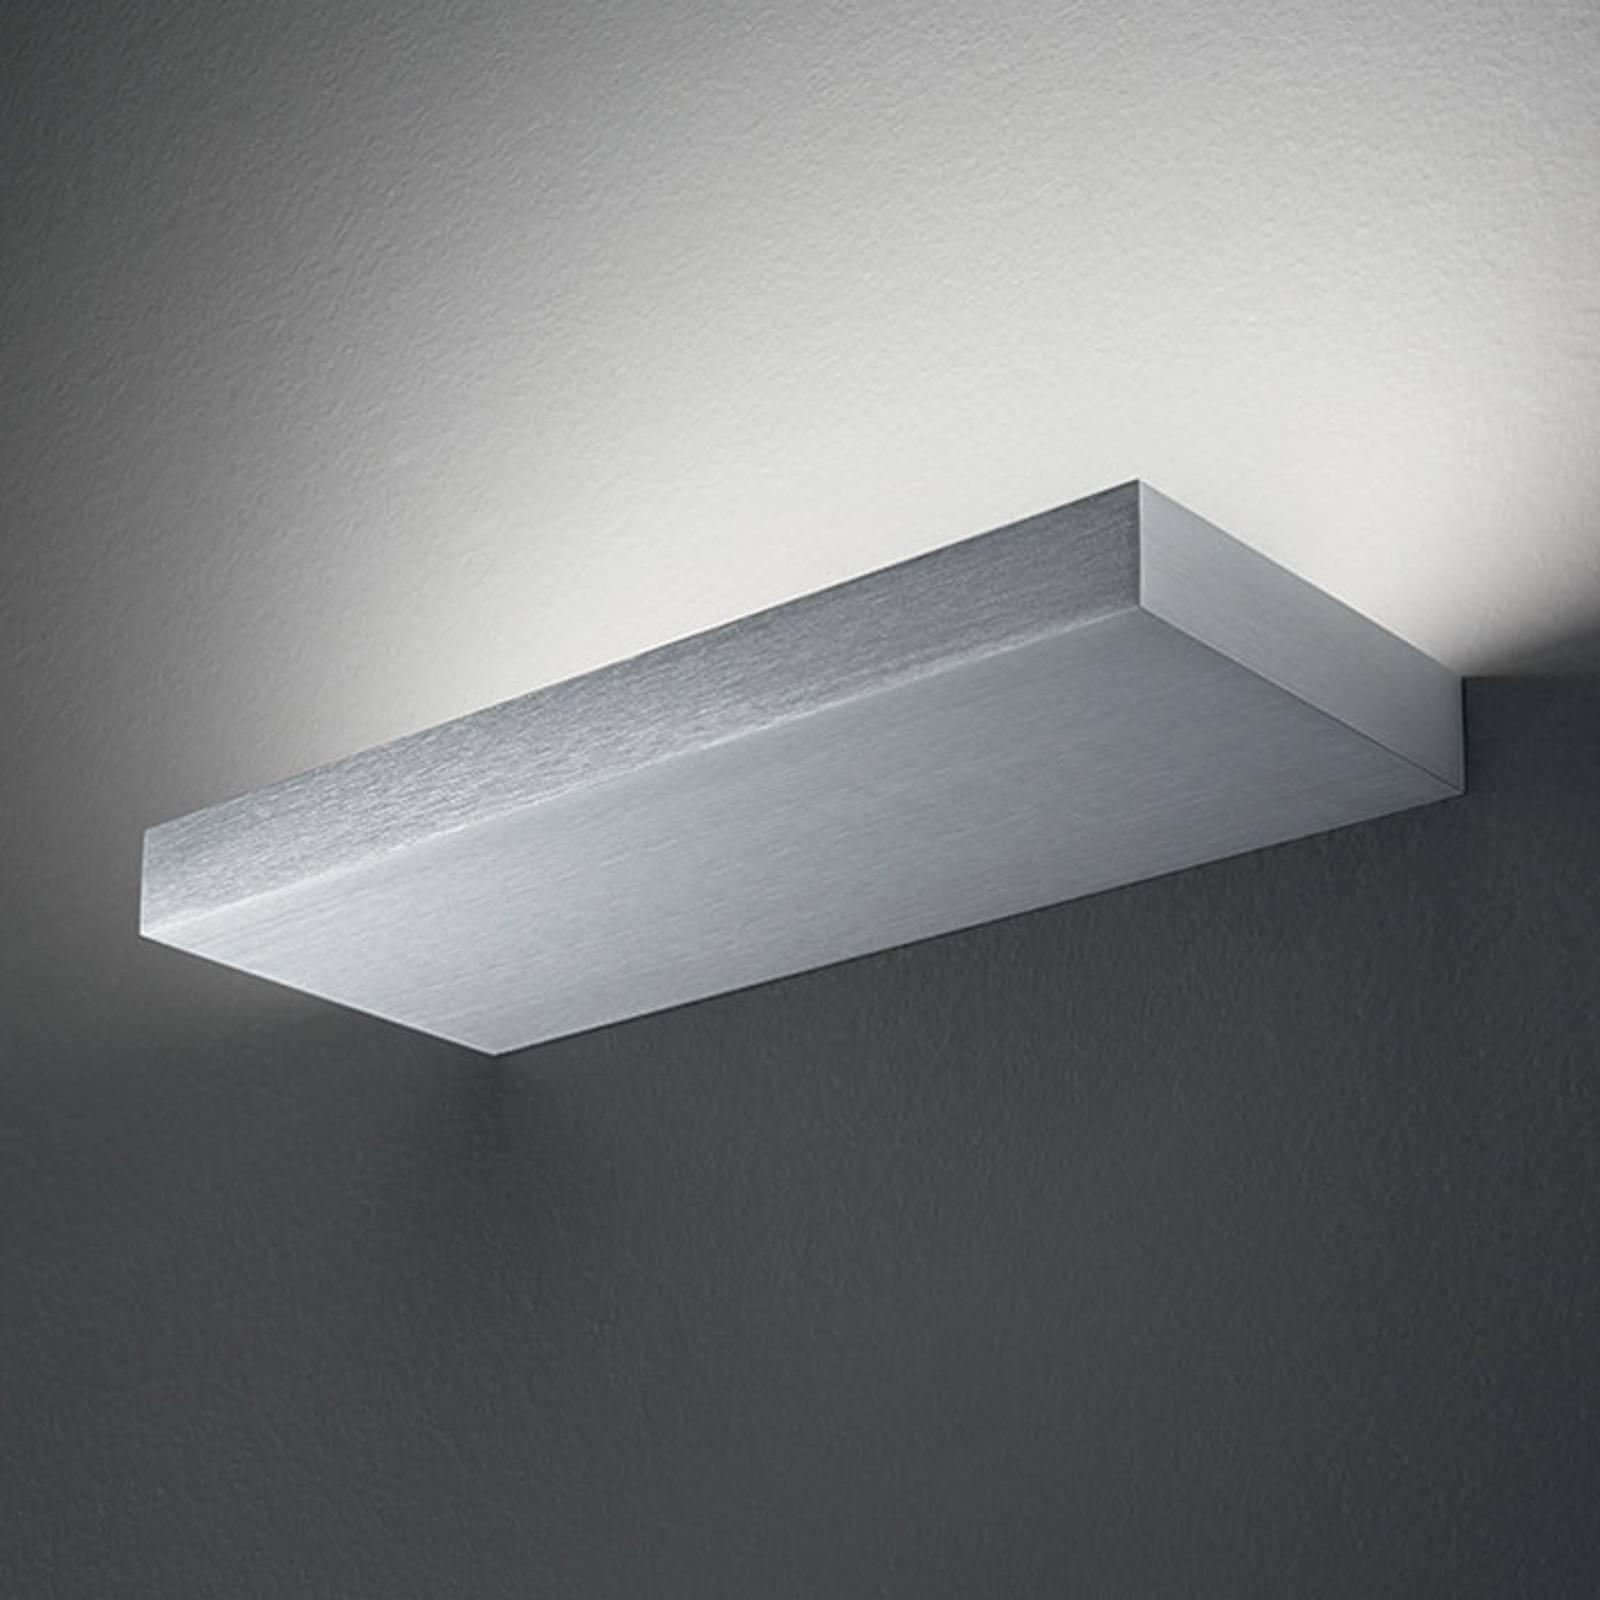 LED-seinävalaisin Regolo, pituus 32,3 cm, alumiini